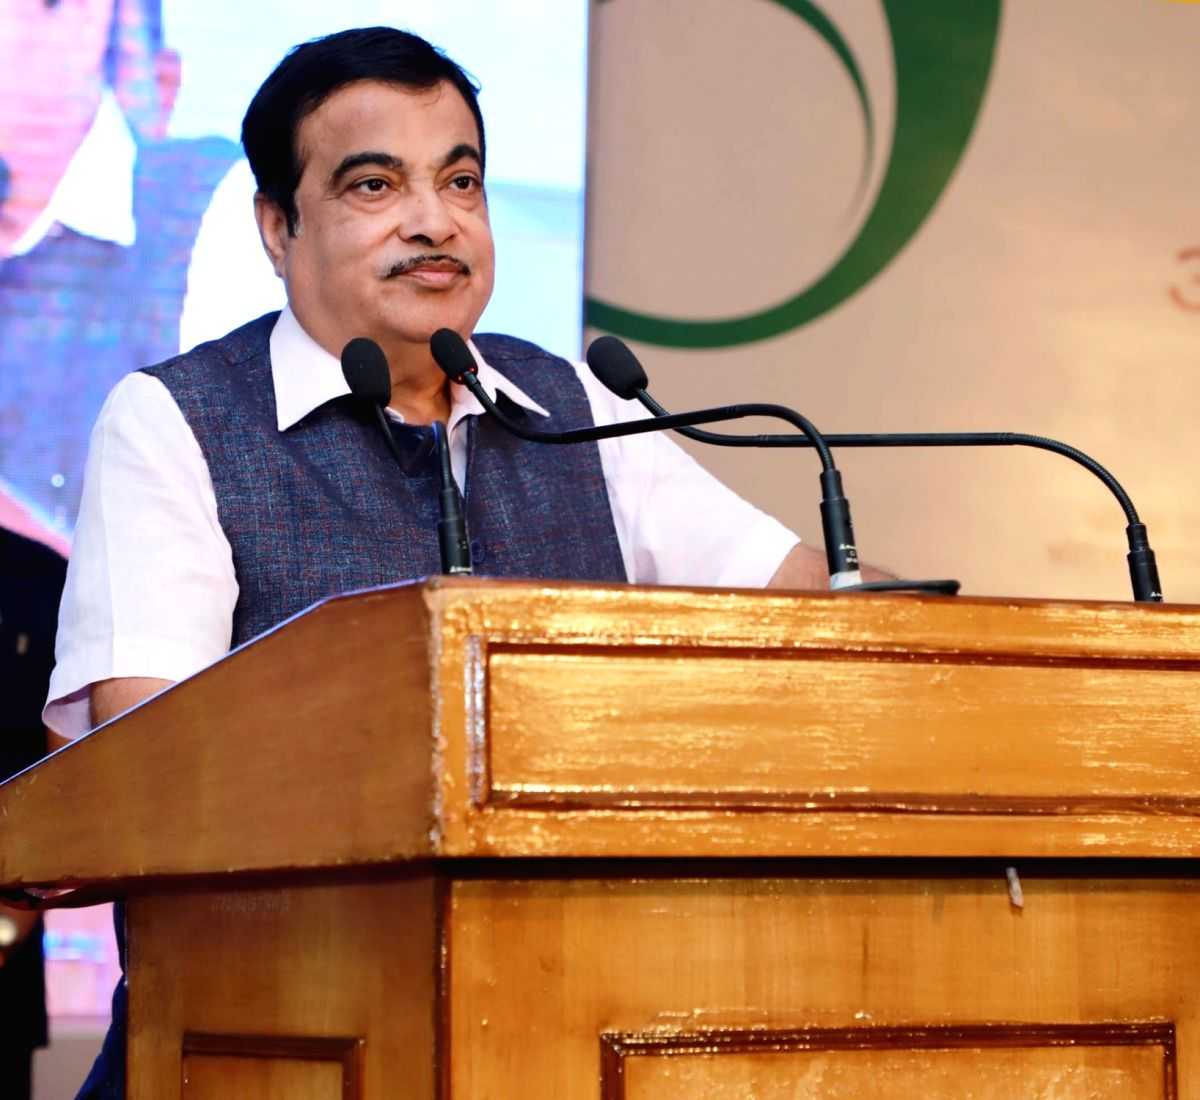 New Delhi: Union Road Transport & Highways and Micro, Small & Medium Enterprises Minister Nitin Gadkari addresses at the inauguration of the 39th edition of the India International Trade Fair (IITF) at Pragati Maidan, in New Delhi on Nov 14, 2019. (P